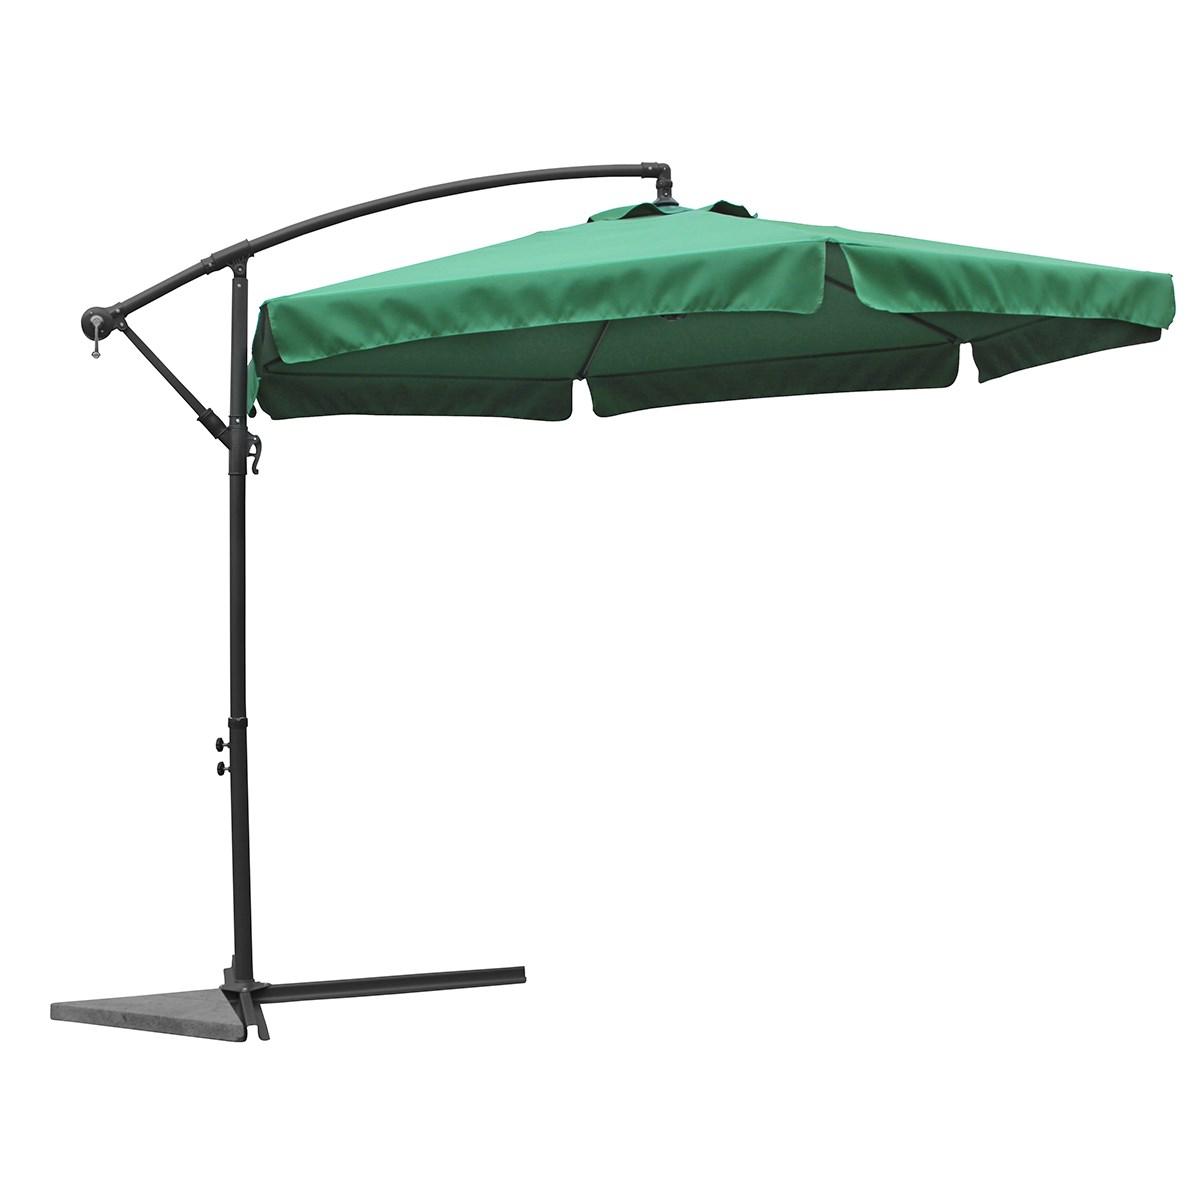 Grand parasol 3 5m nico vert tr s stable inclinable avec manivelle jardin piscine - Grand parasol ...